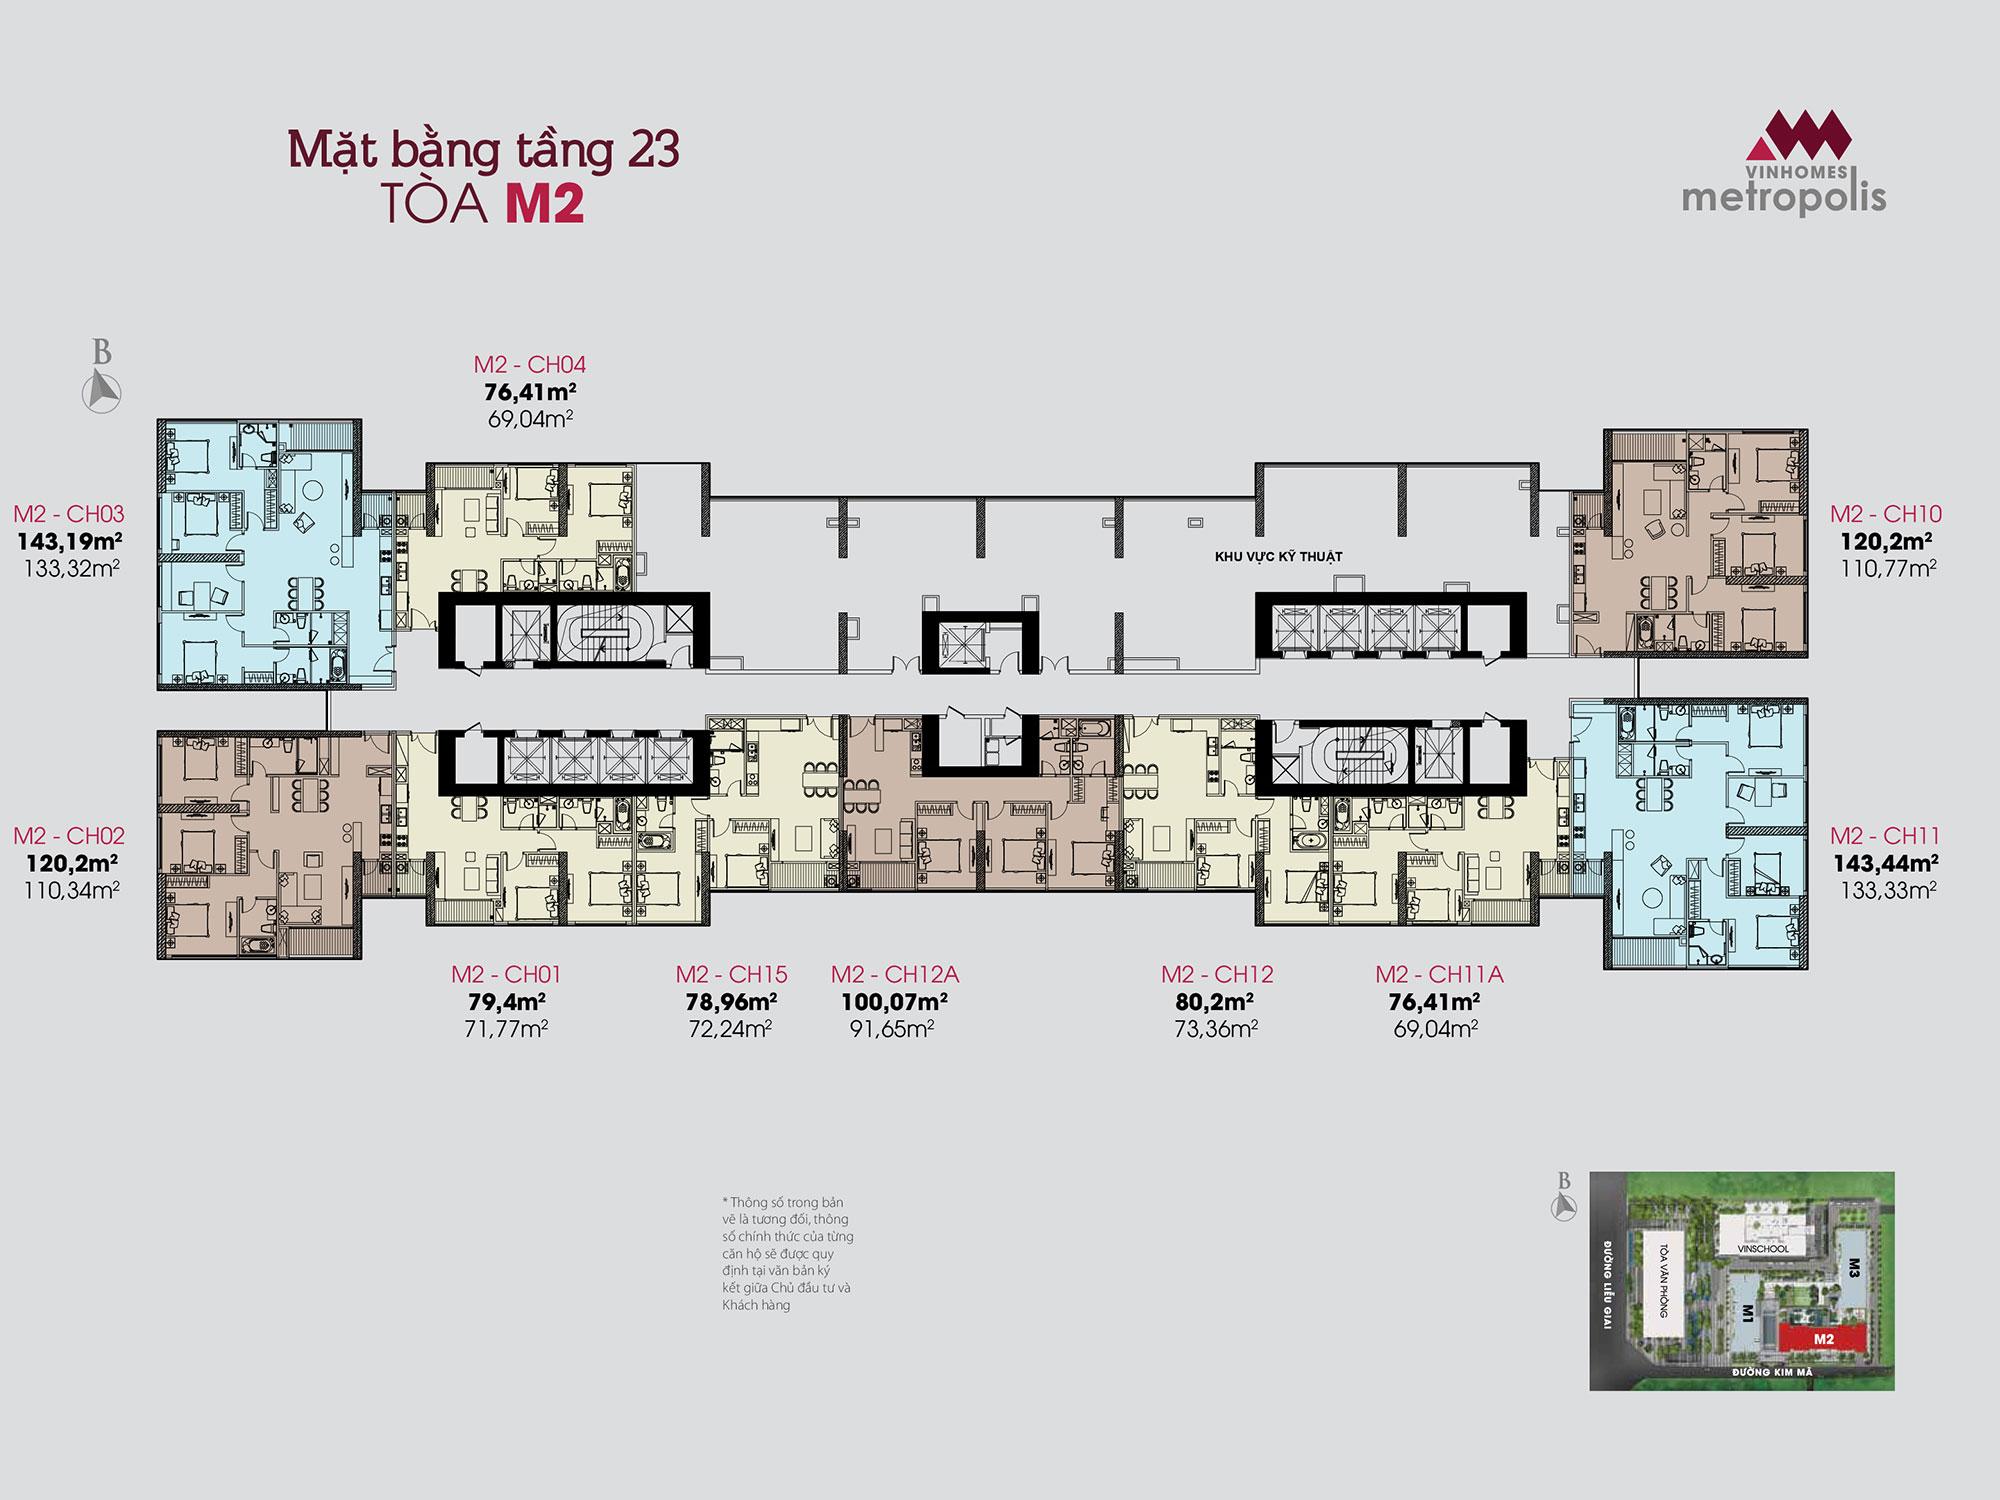 mat-bang-tang-23-toa-m2-vinhomes-metropolis